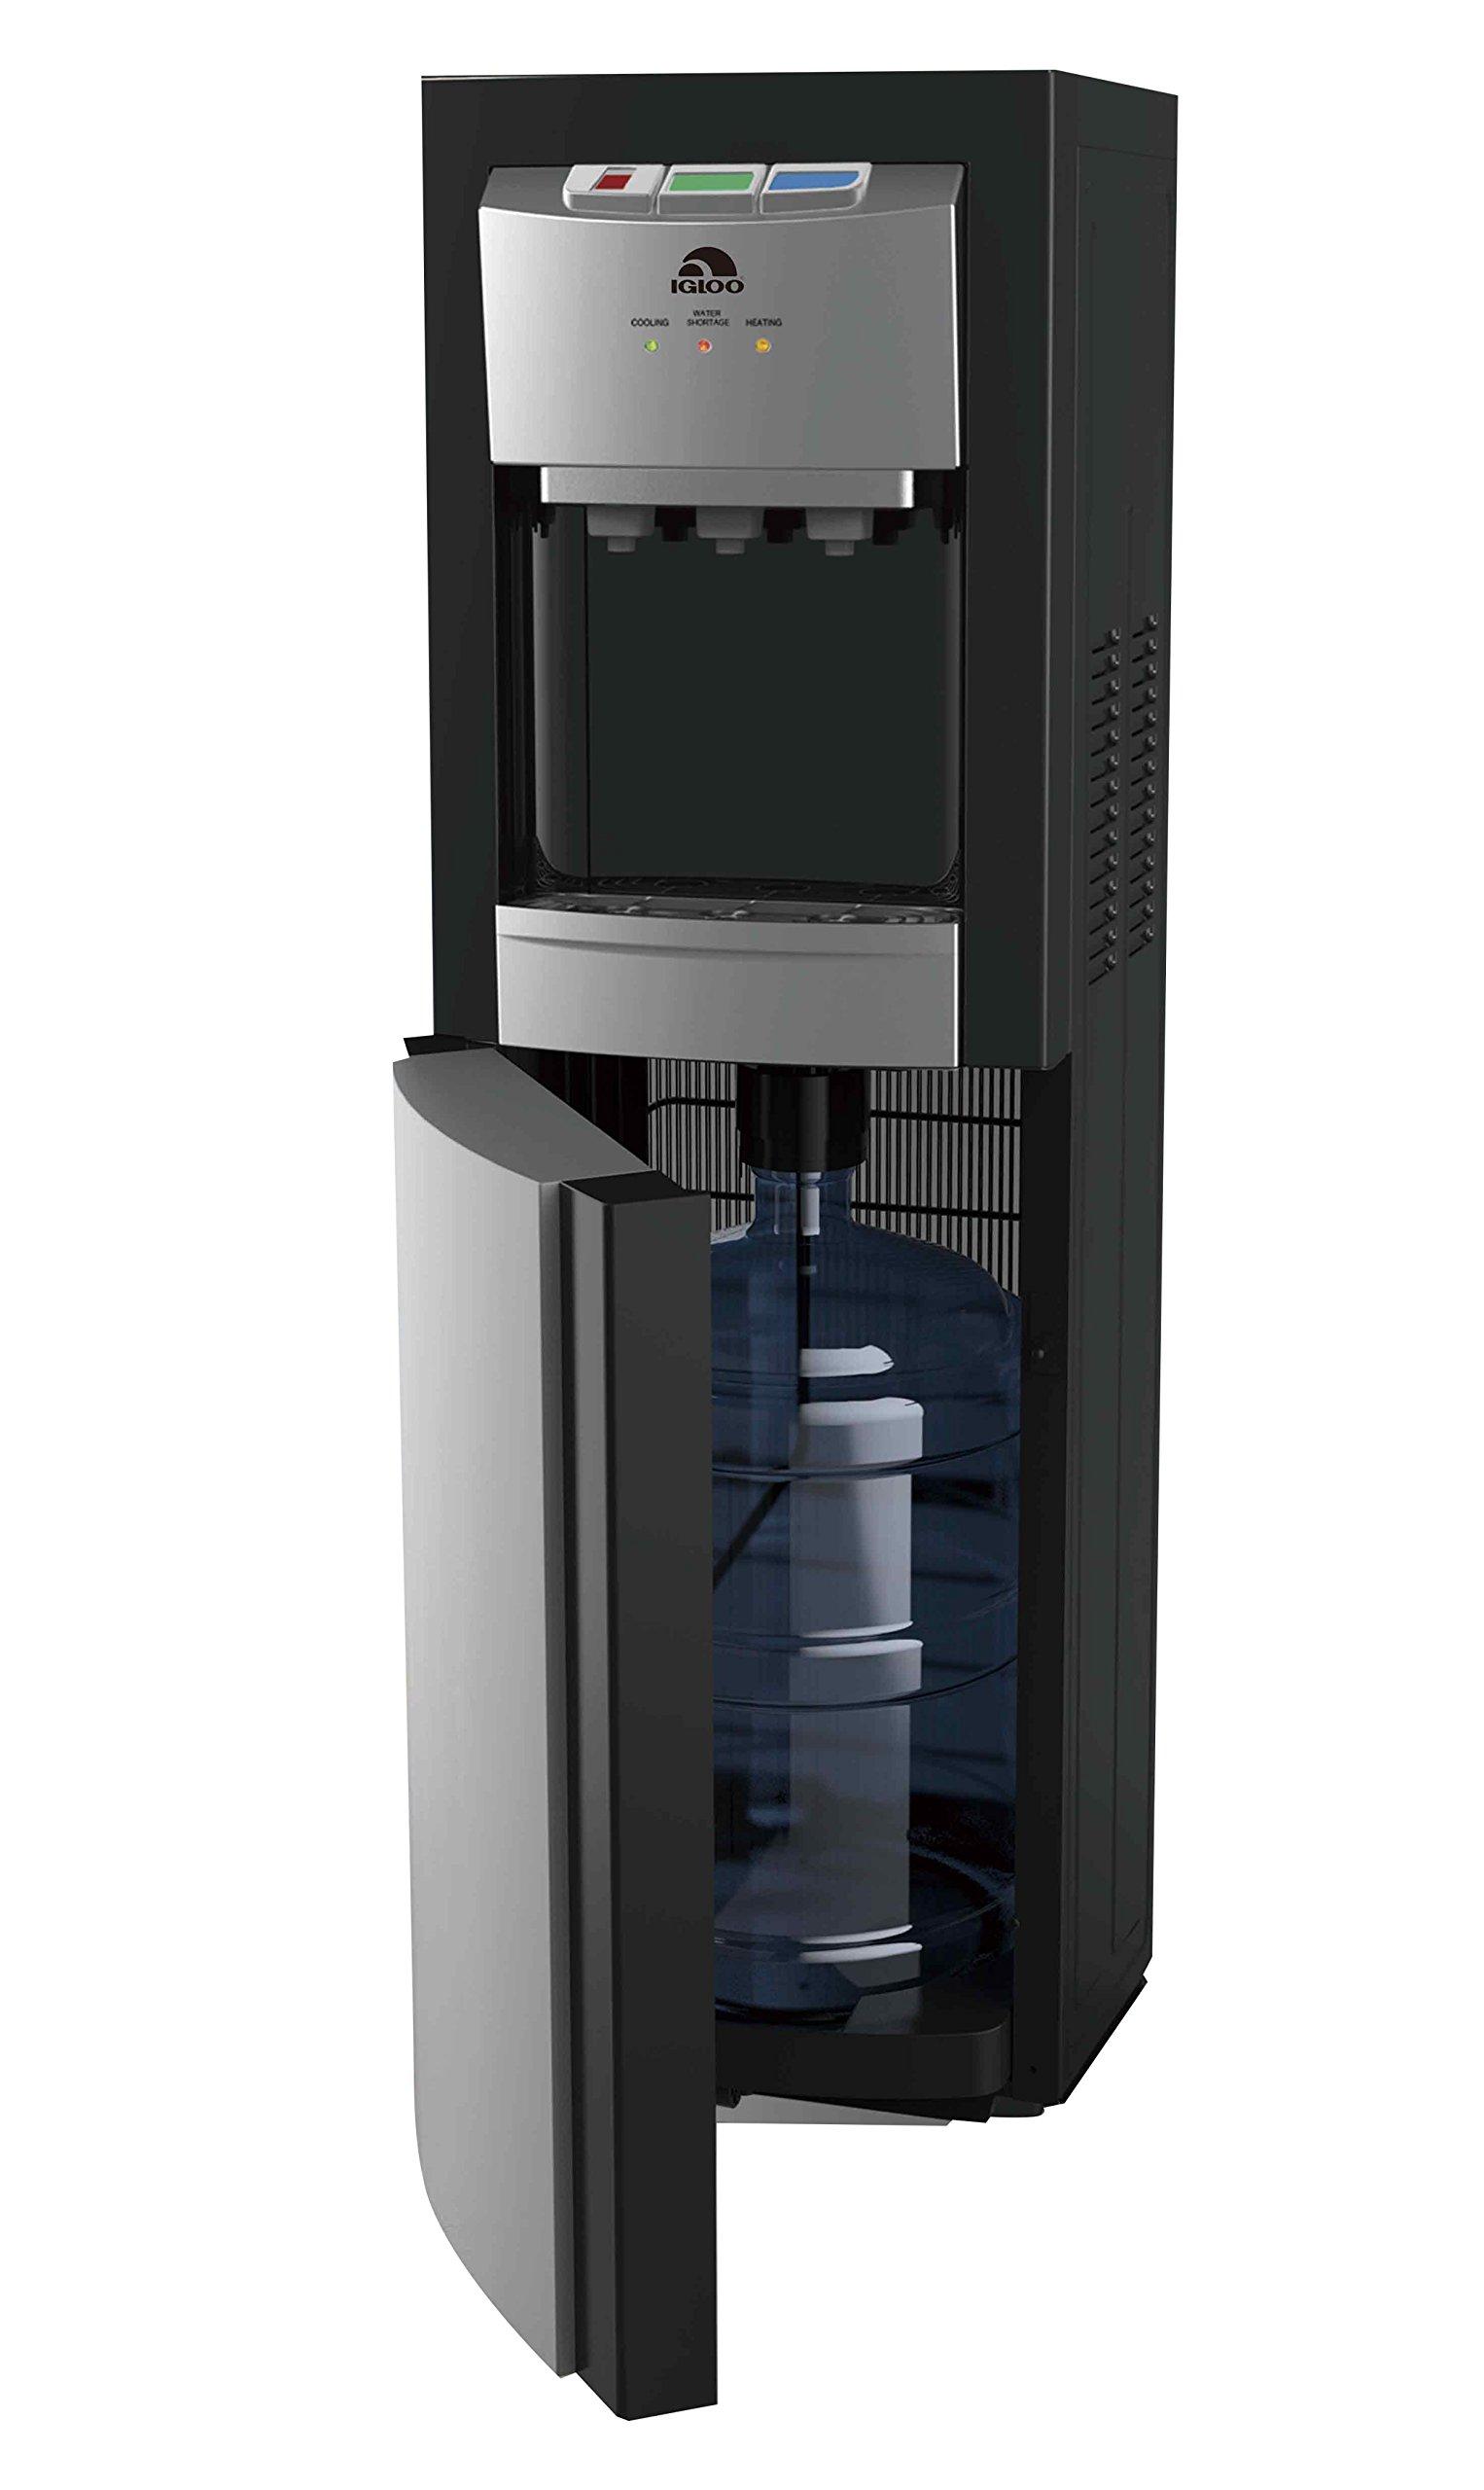 Igloo MWC8988 Bottom Loading Water Cooler Dispenser, Black